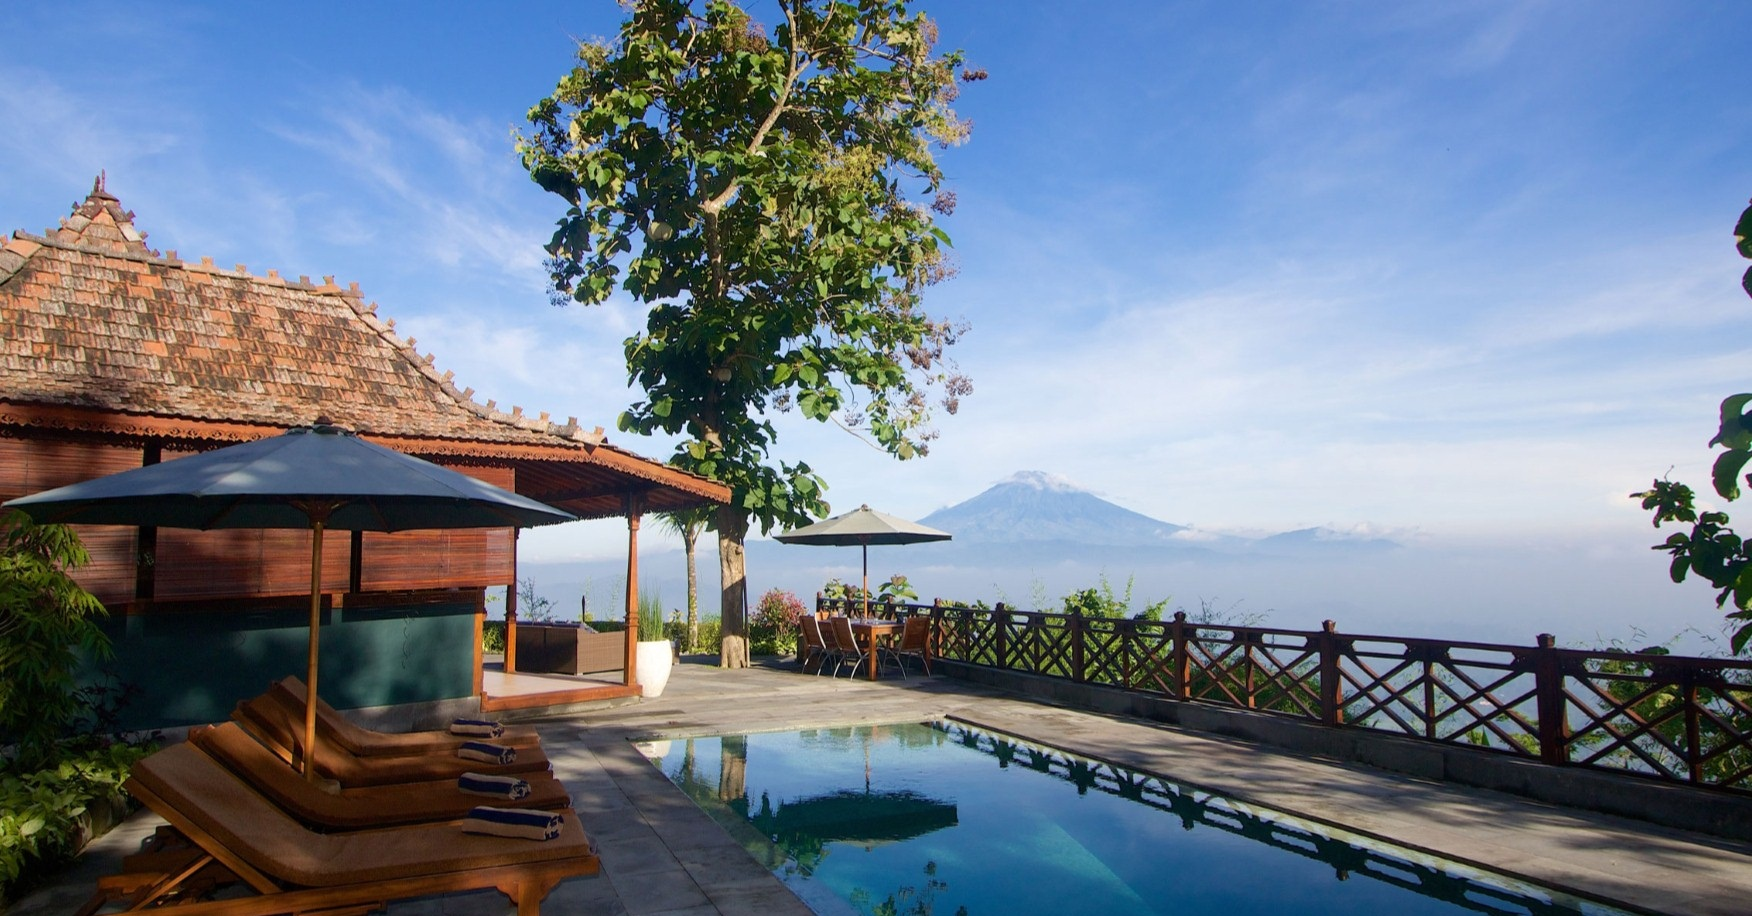 Hotel dekat Candi Borobudur Magelang - traveloka.com